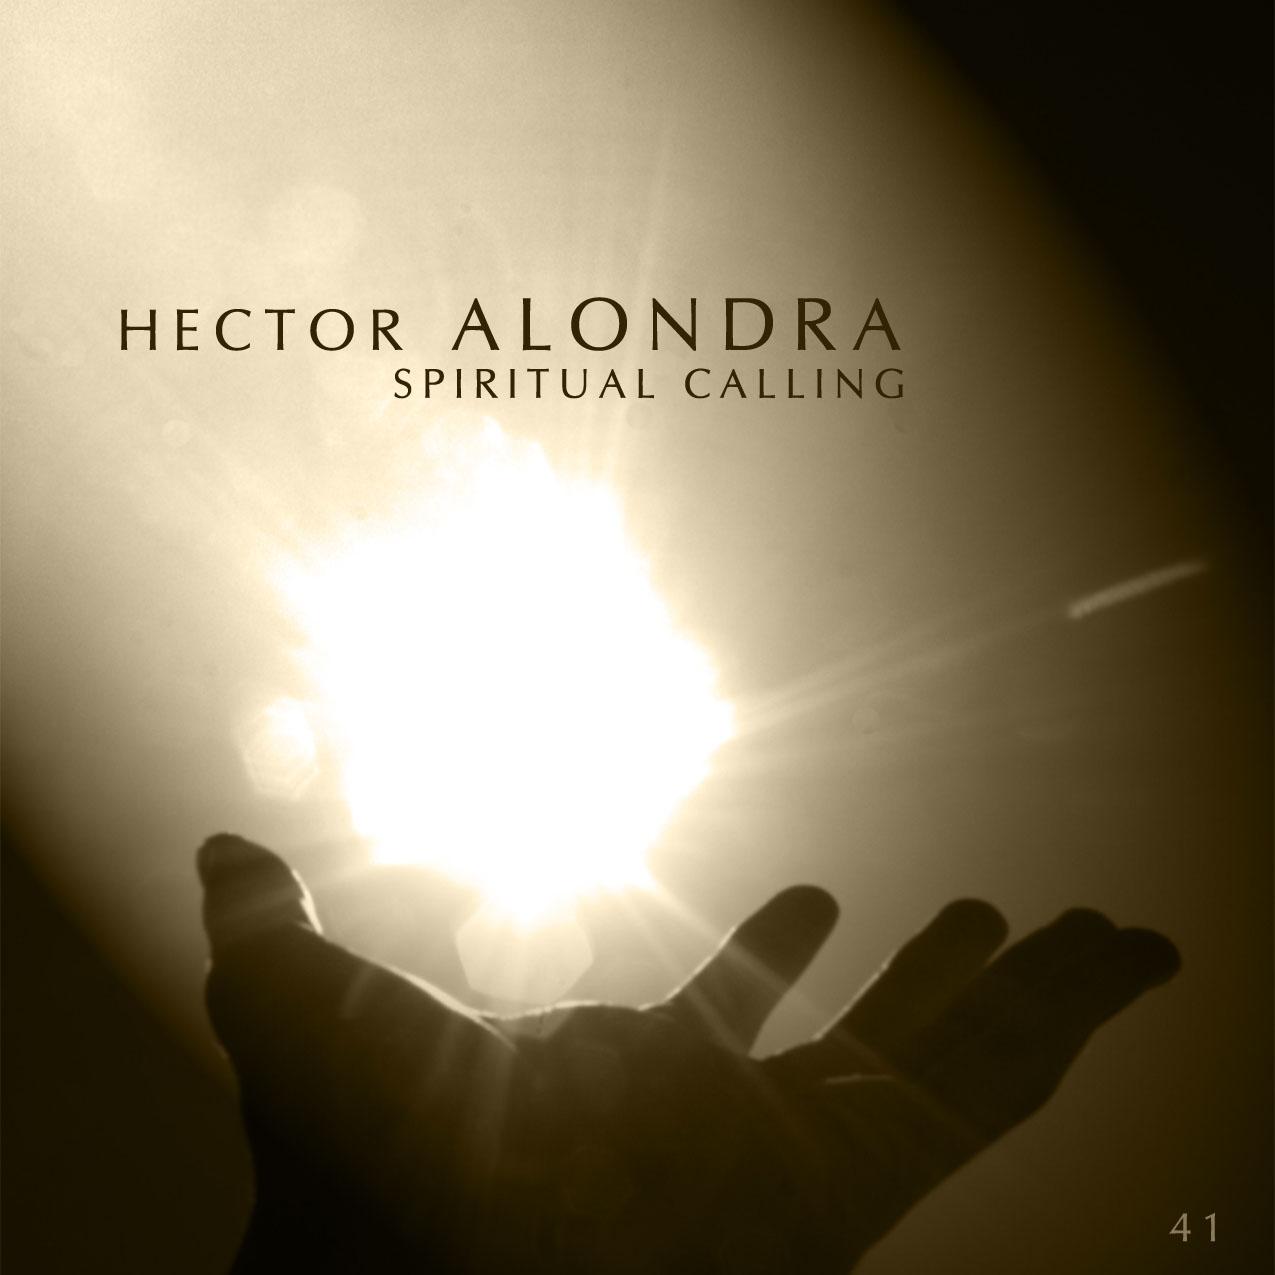 Session 41 - Spiritual Calling